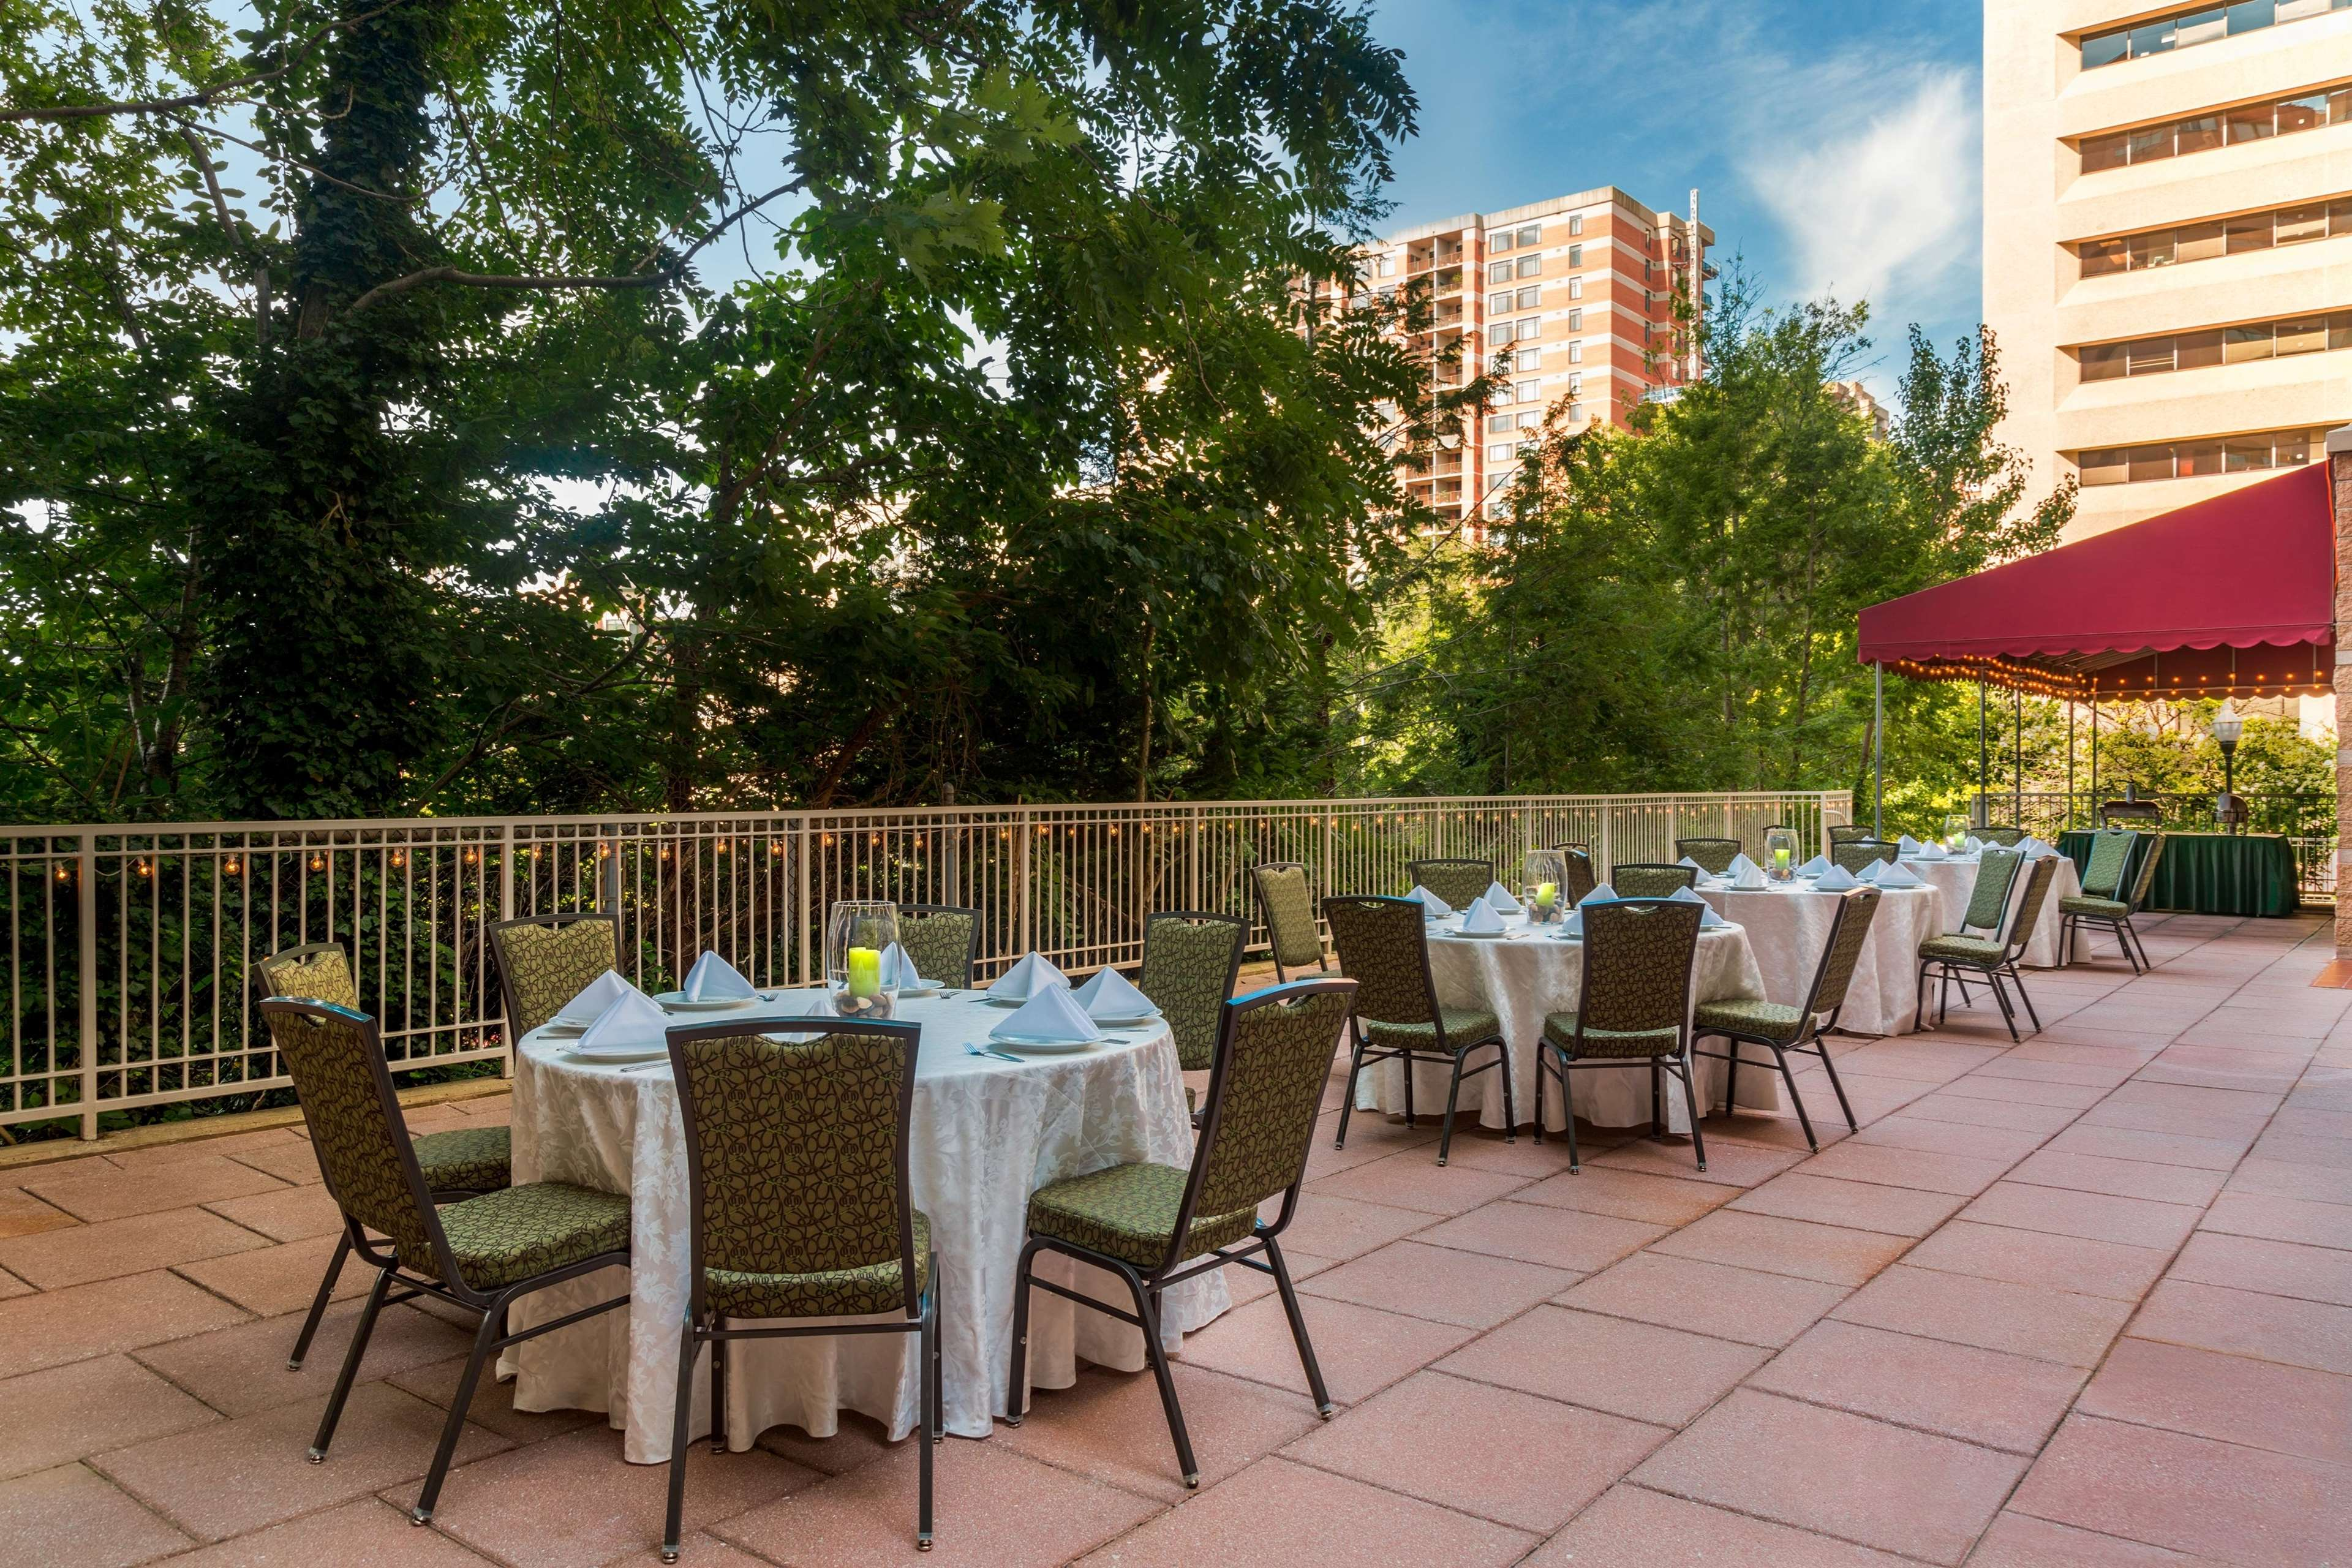 Hilton Garden Inn Arlington/Courthouse Plaza image 37